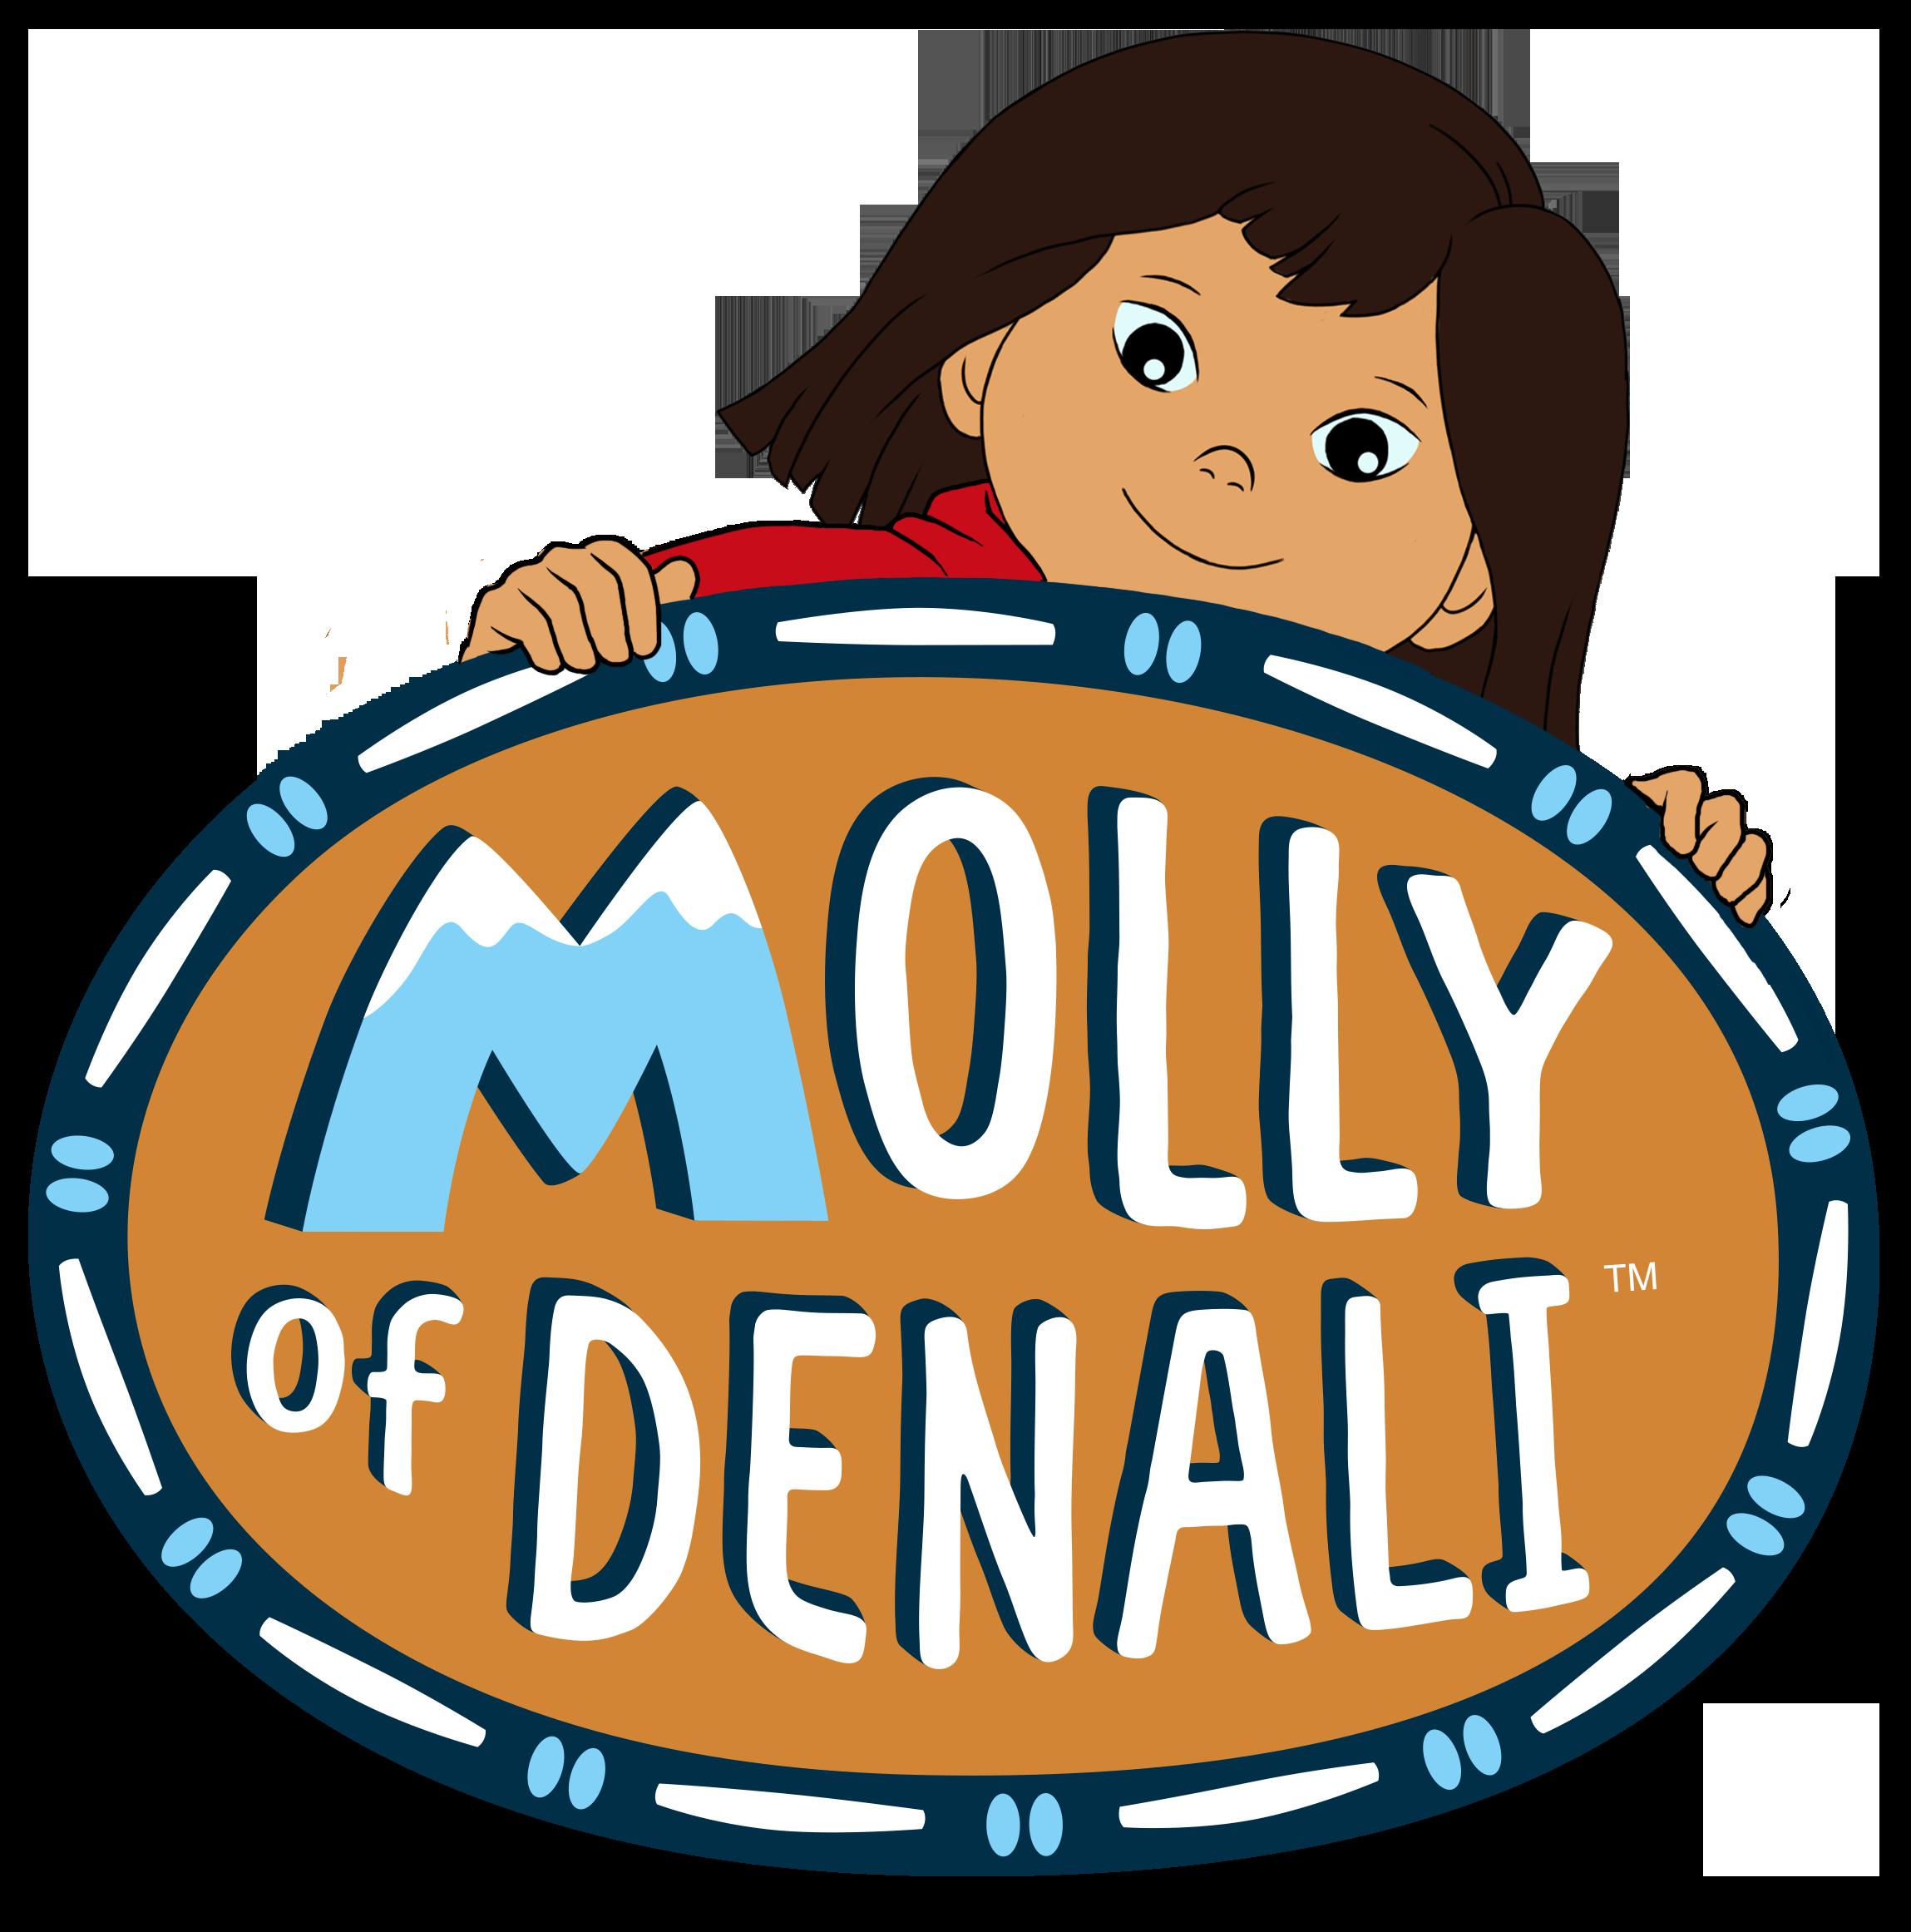 Molly of Denali album art